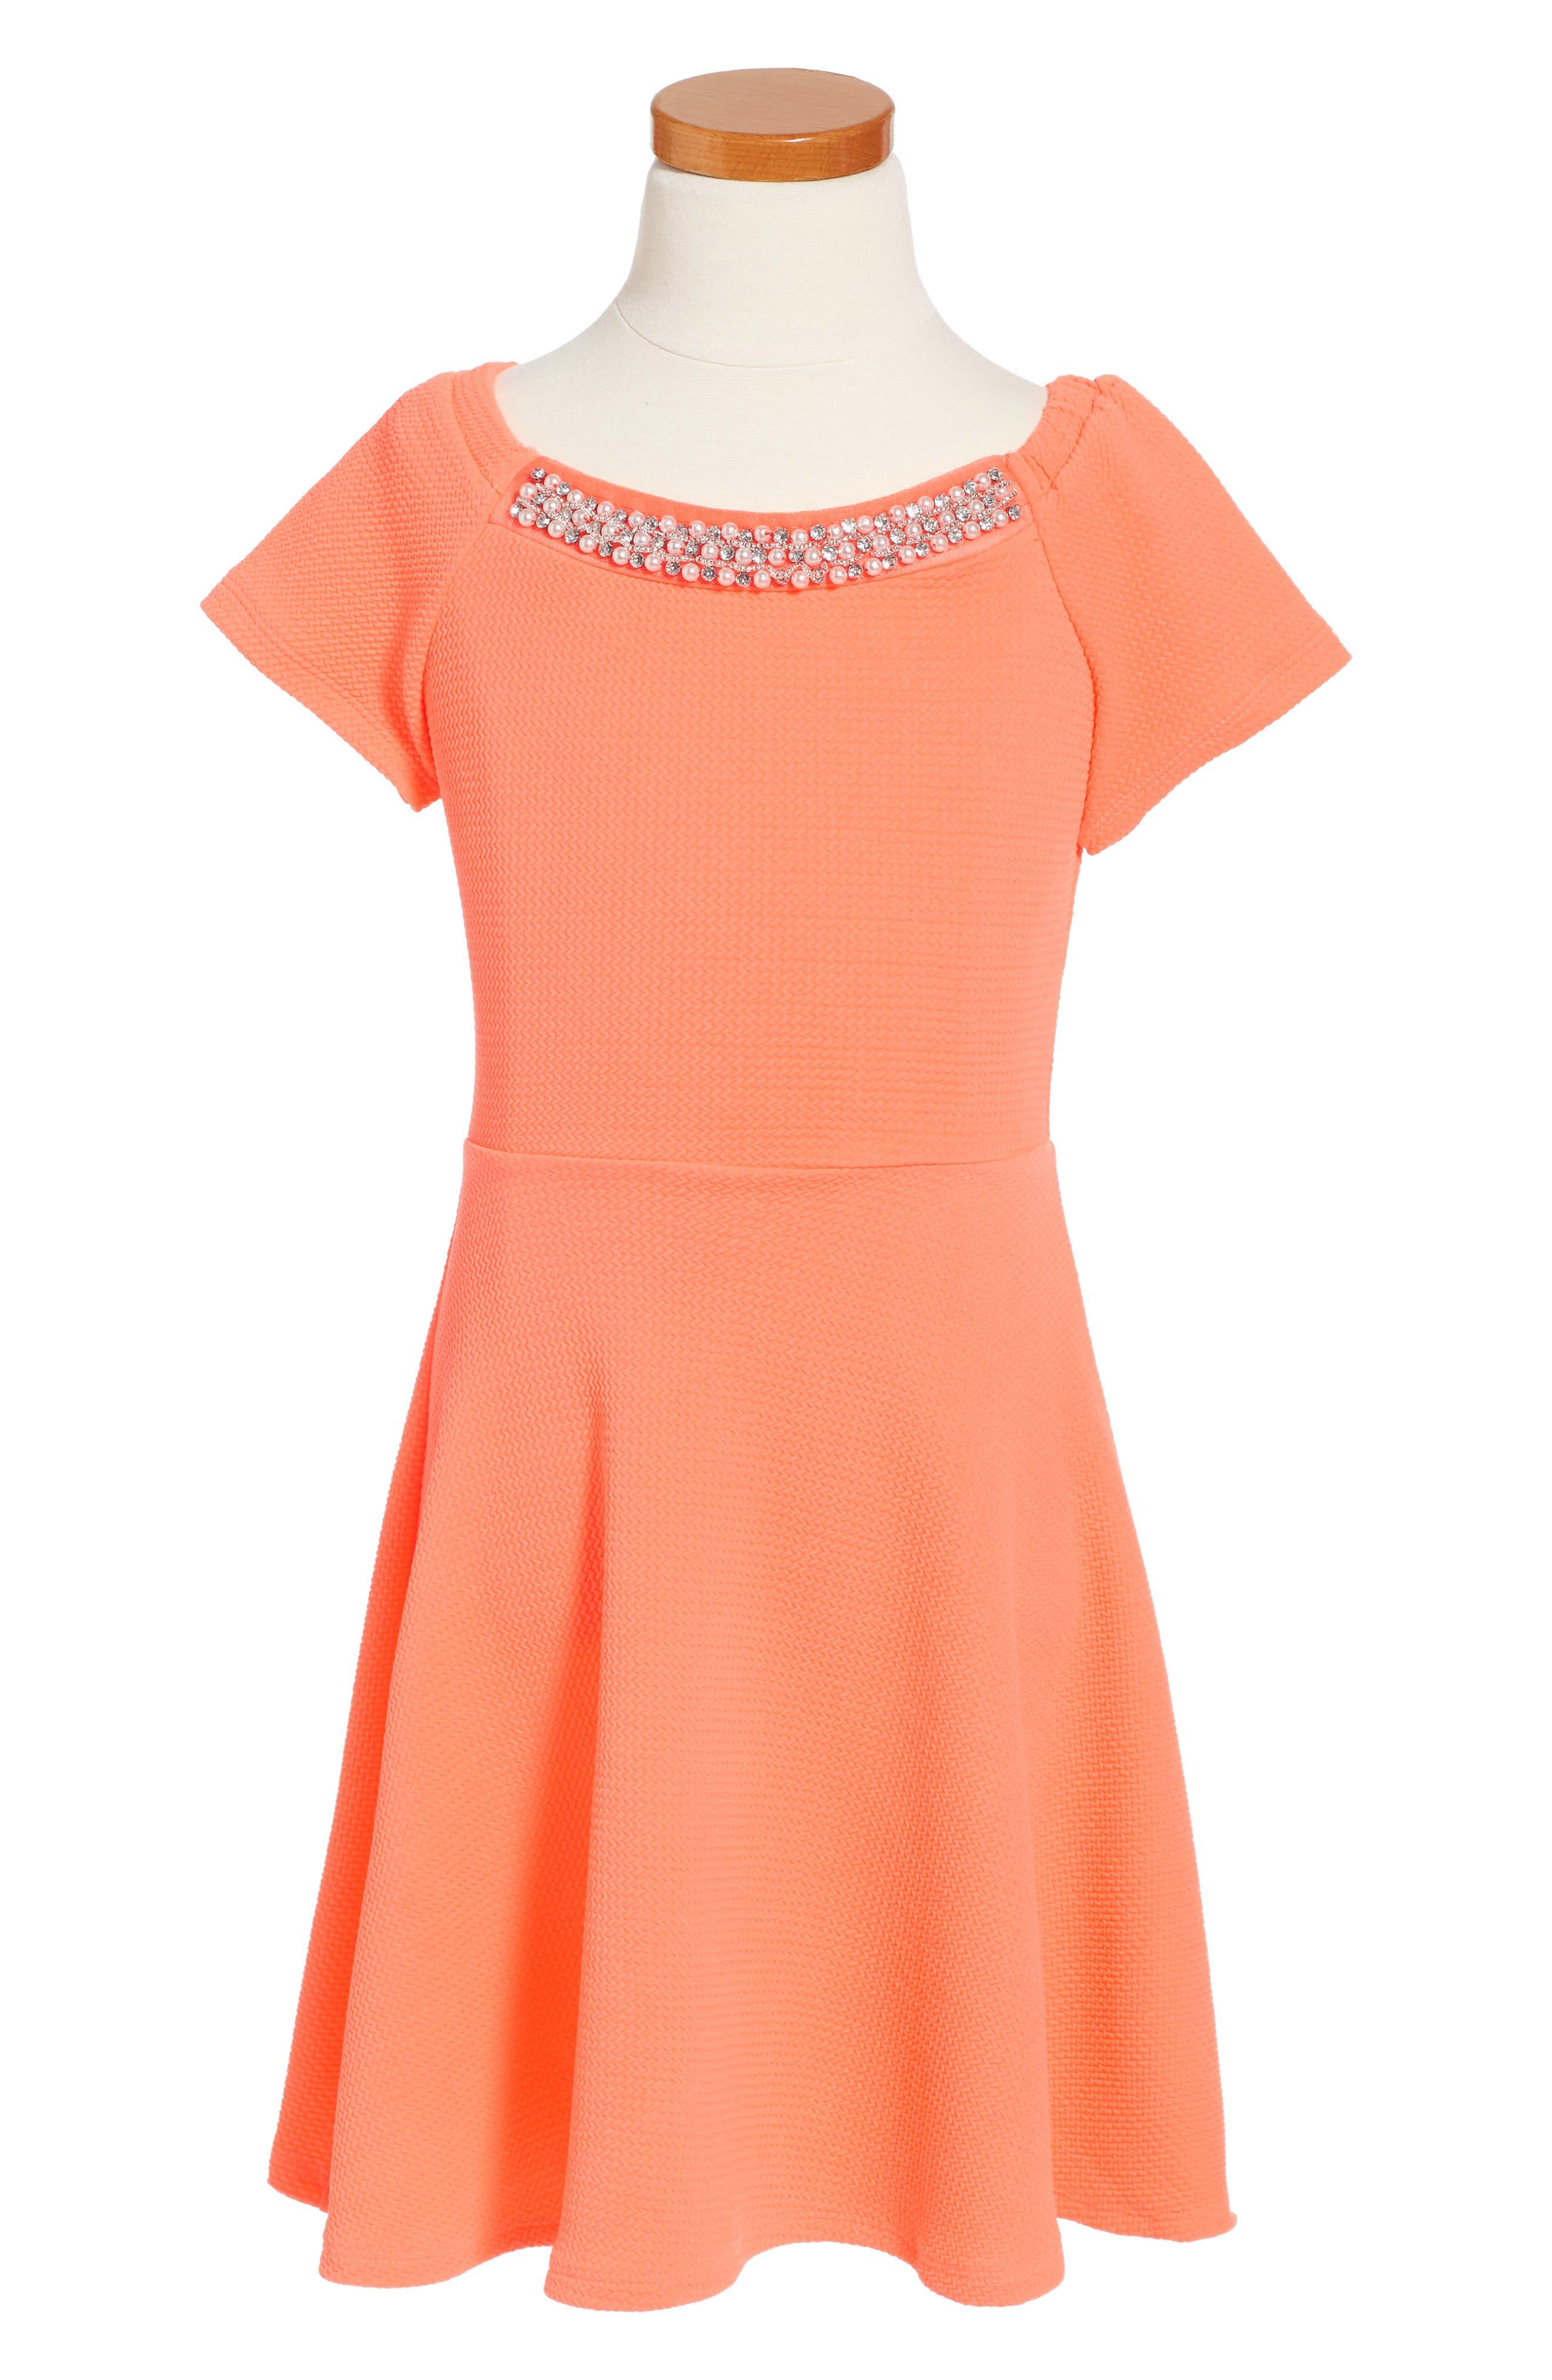 Skater Dress,                         Main,                         color, Bright Orange